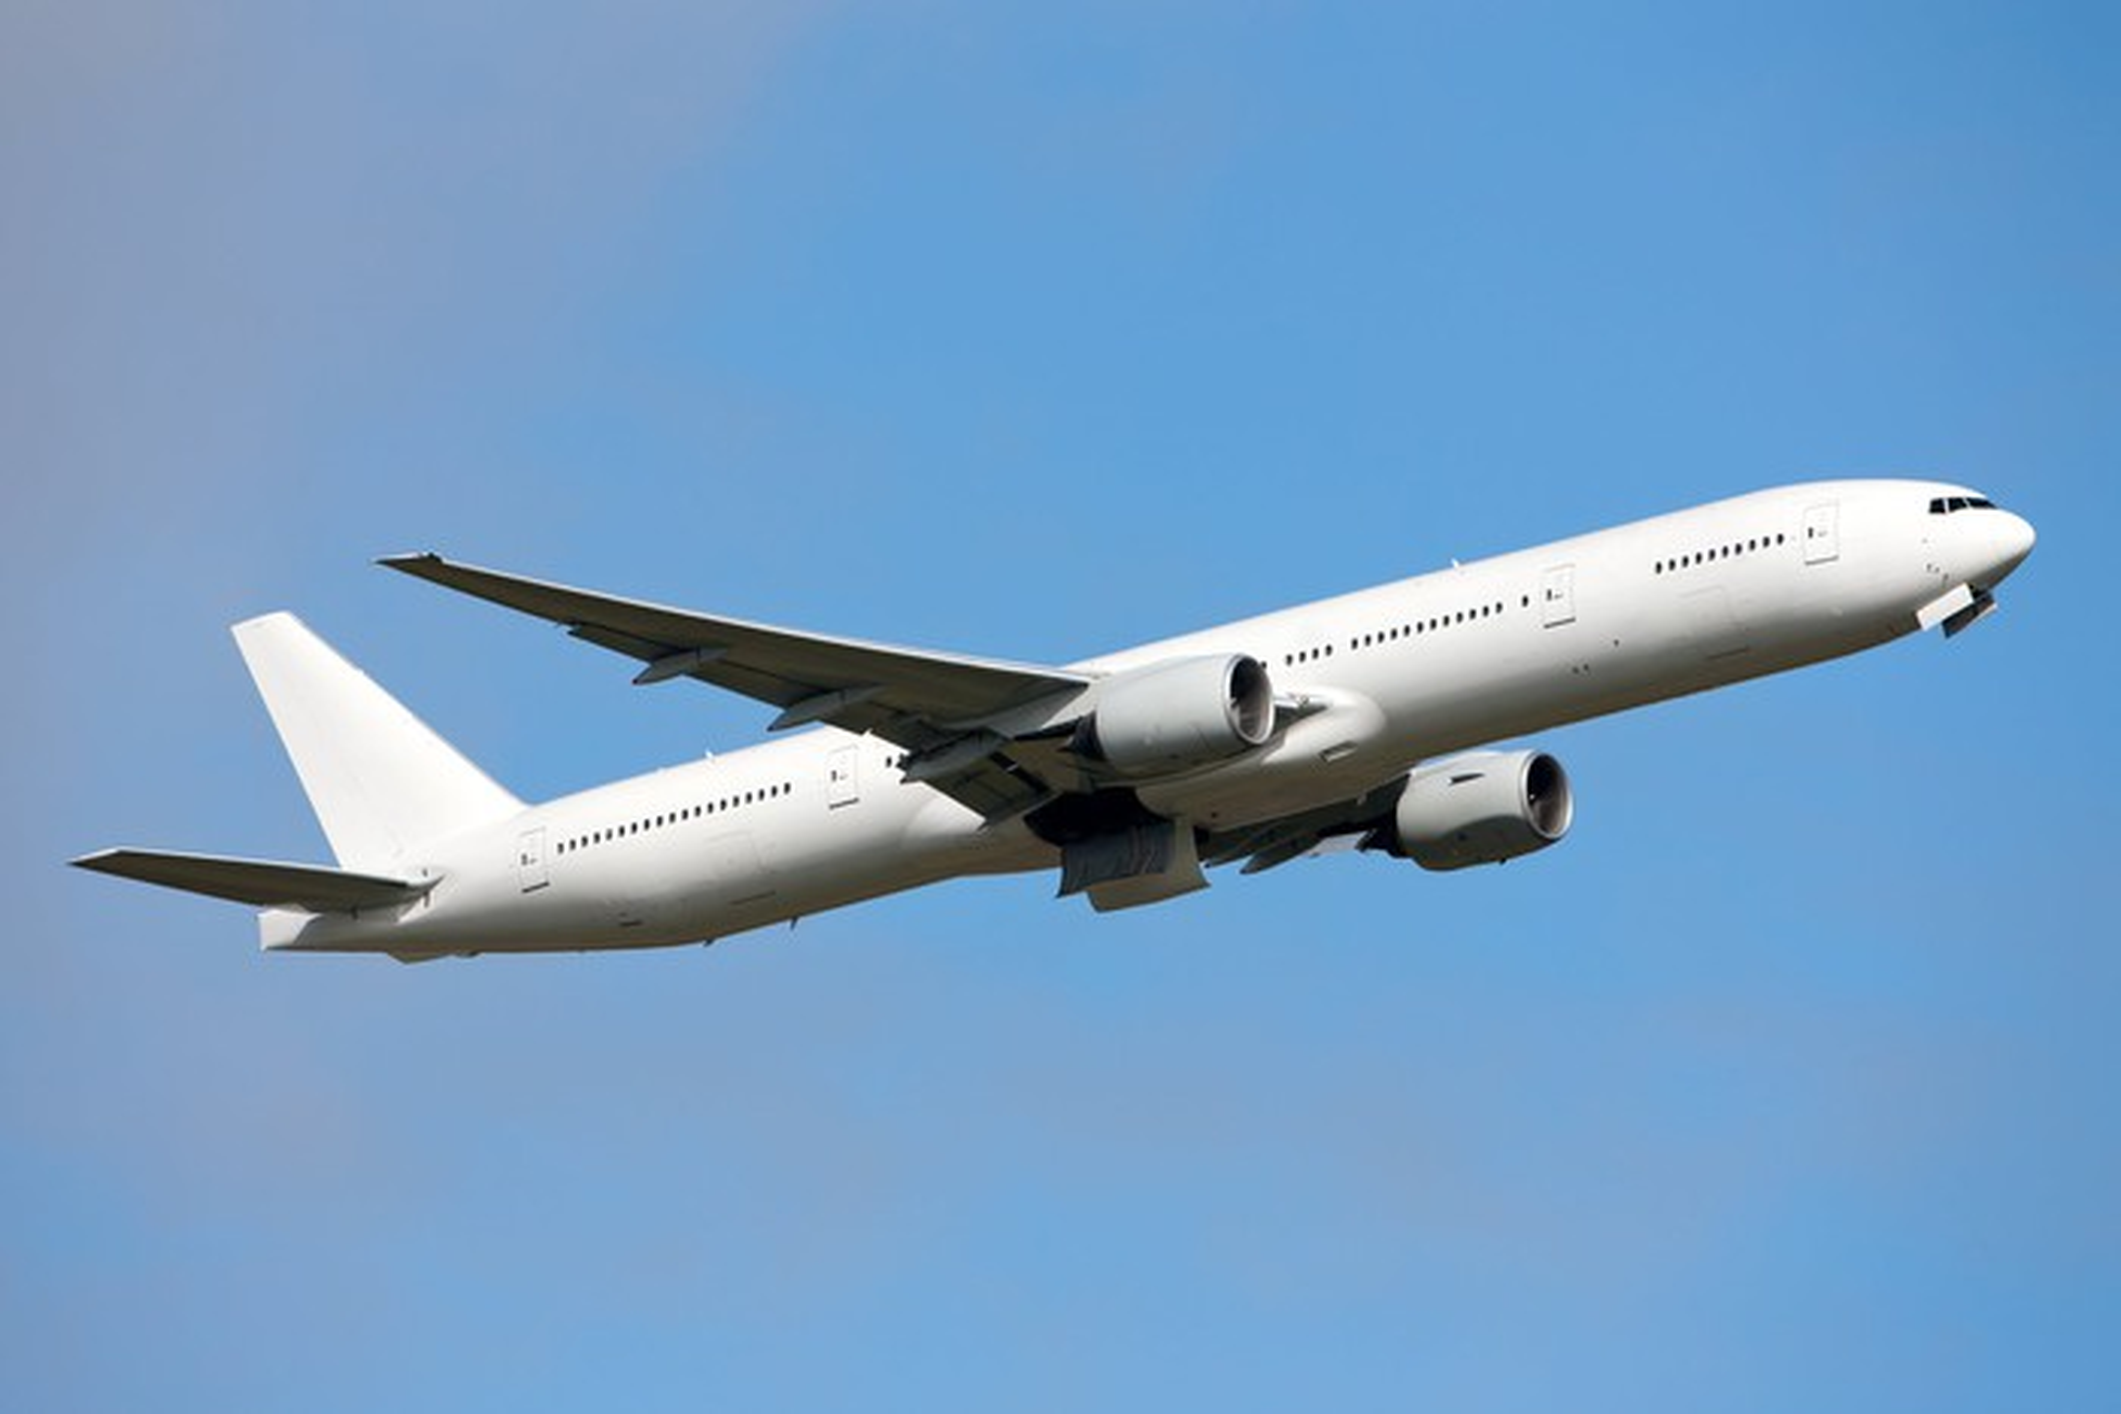 Boeing 777 airliner in flight.